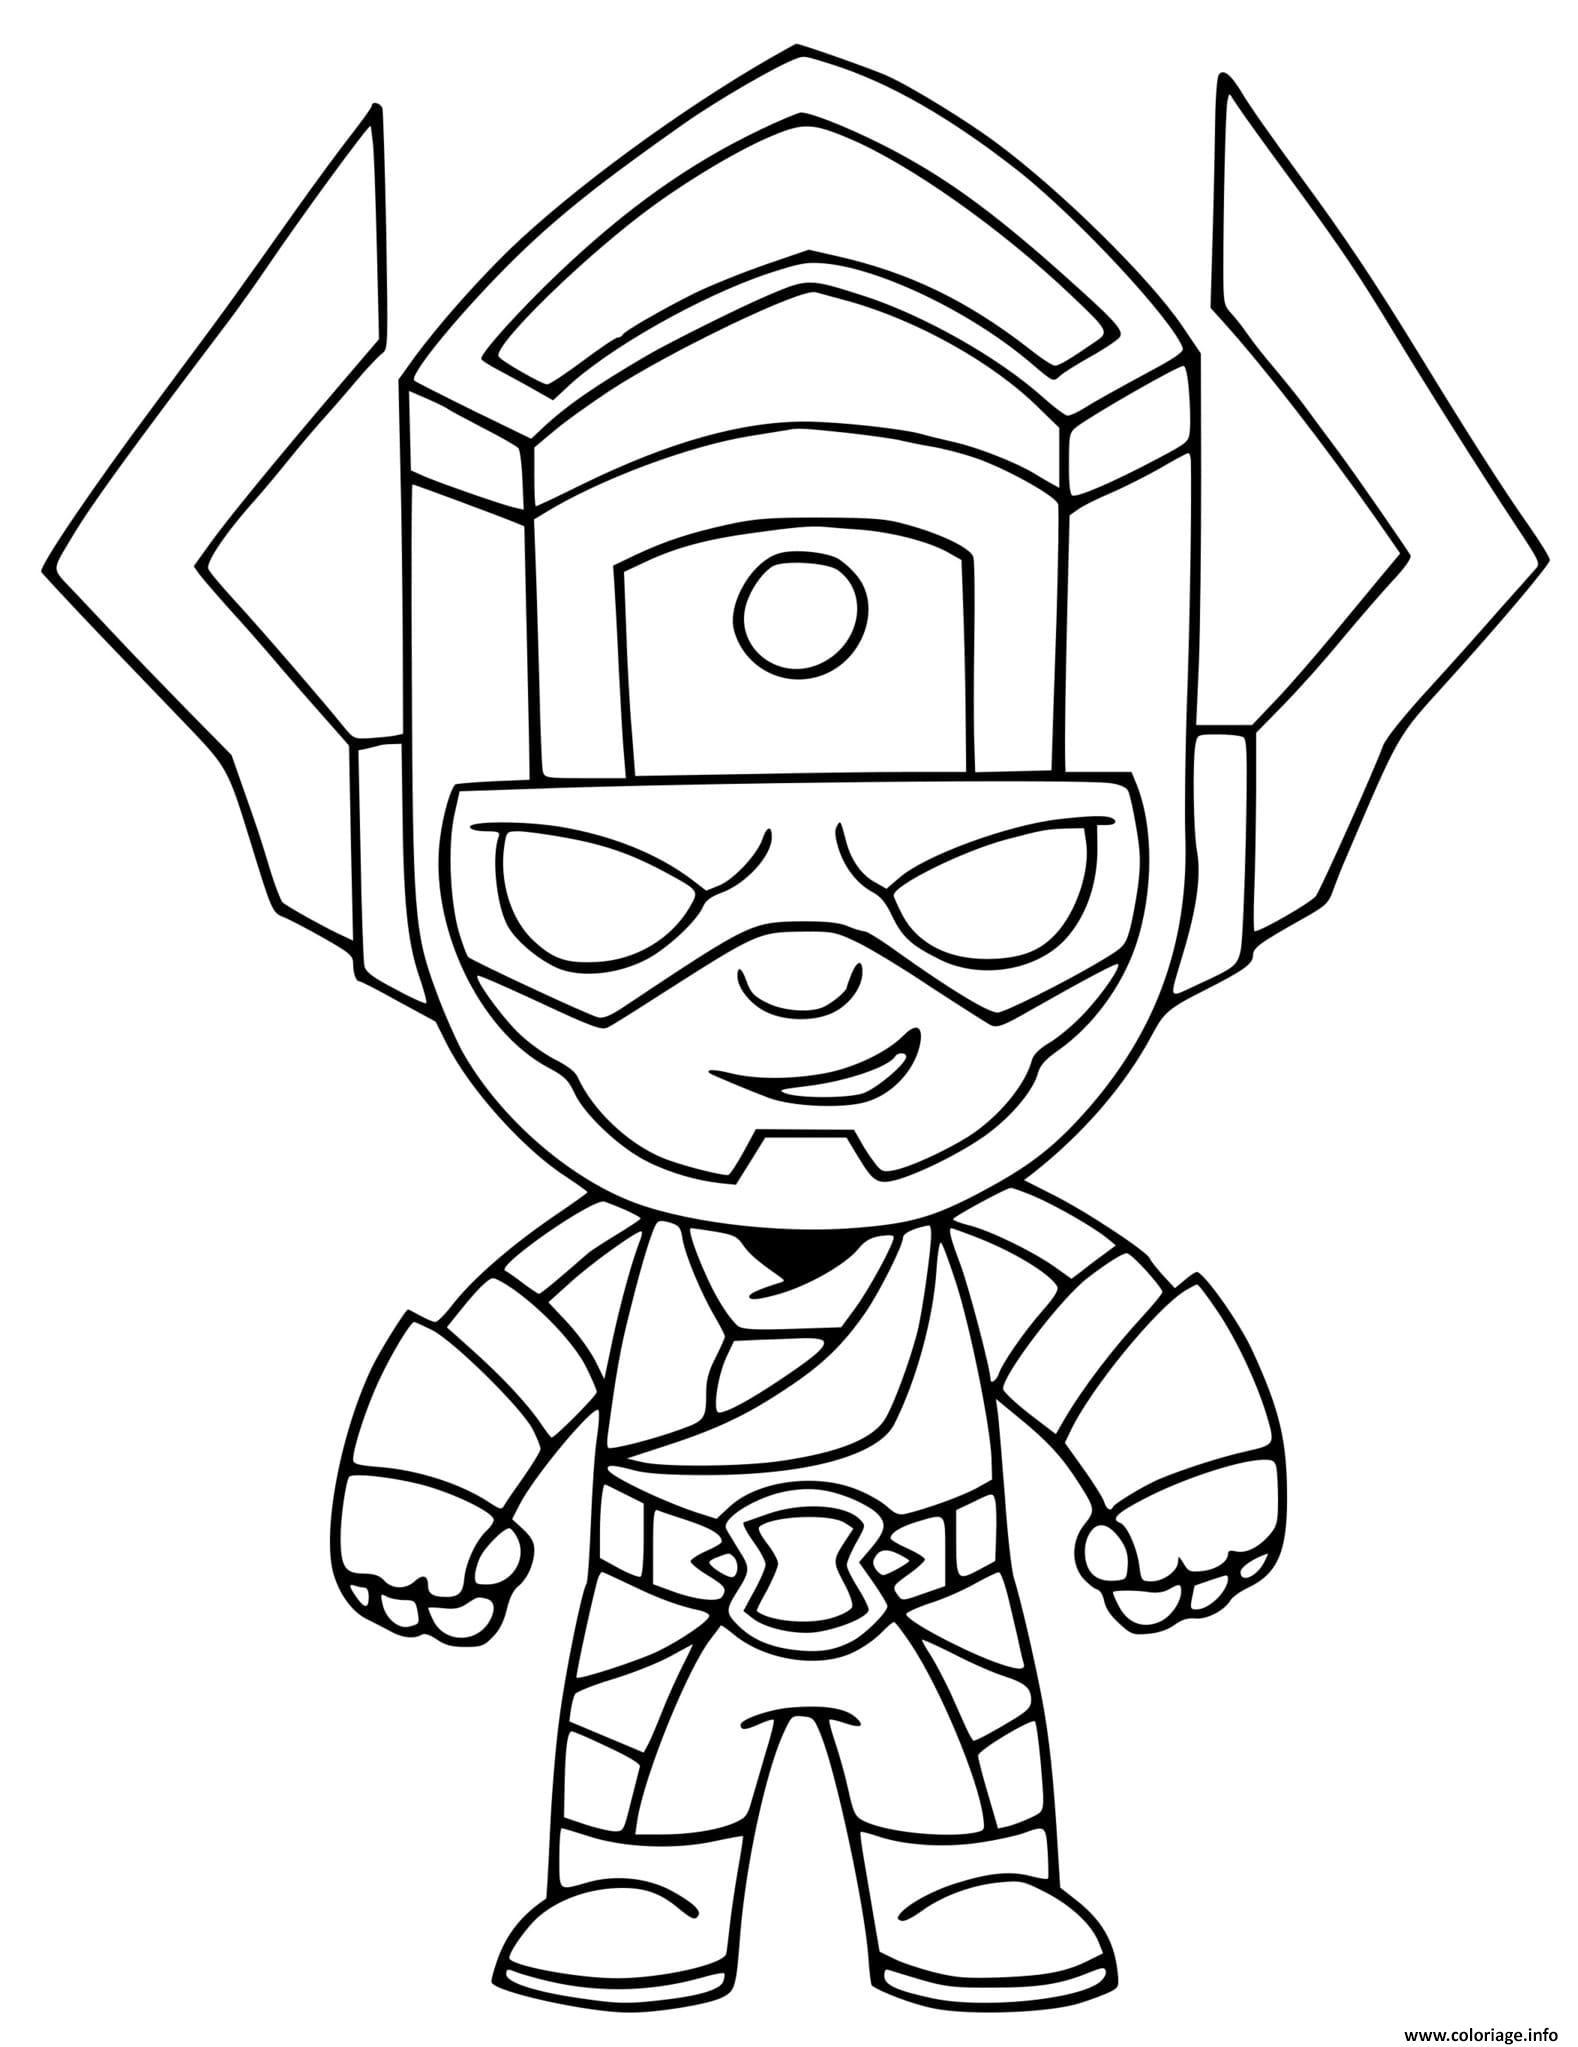 Dessin Galactus Fortnite Coloriage Gratuit à Imprimer